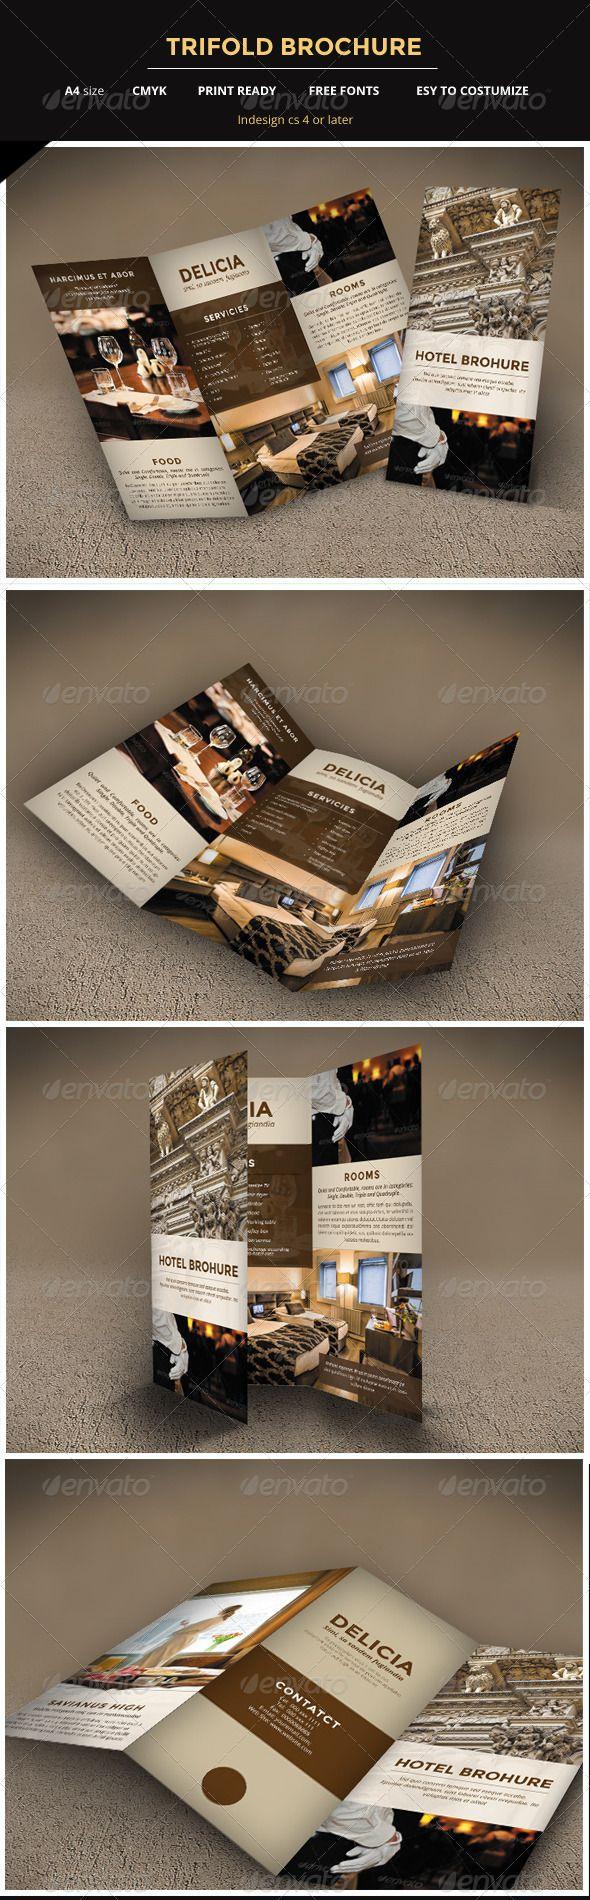 hotel brochure template free